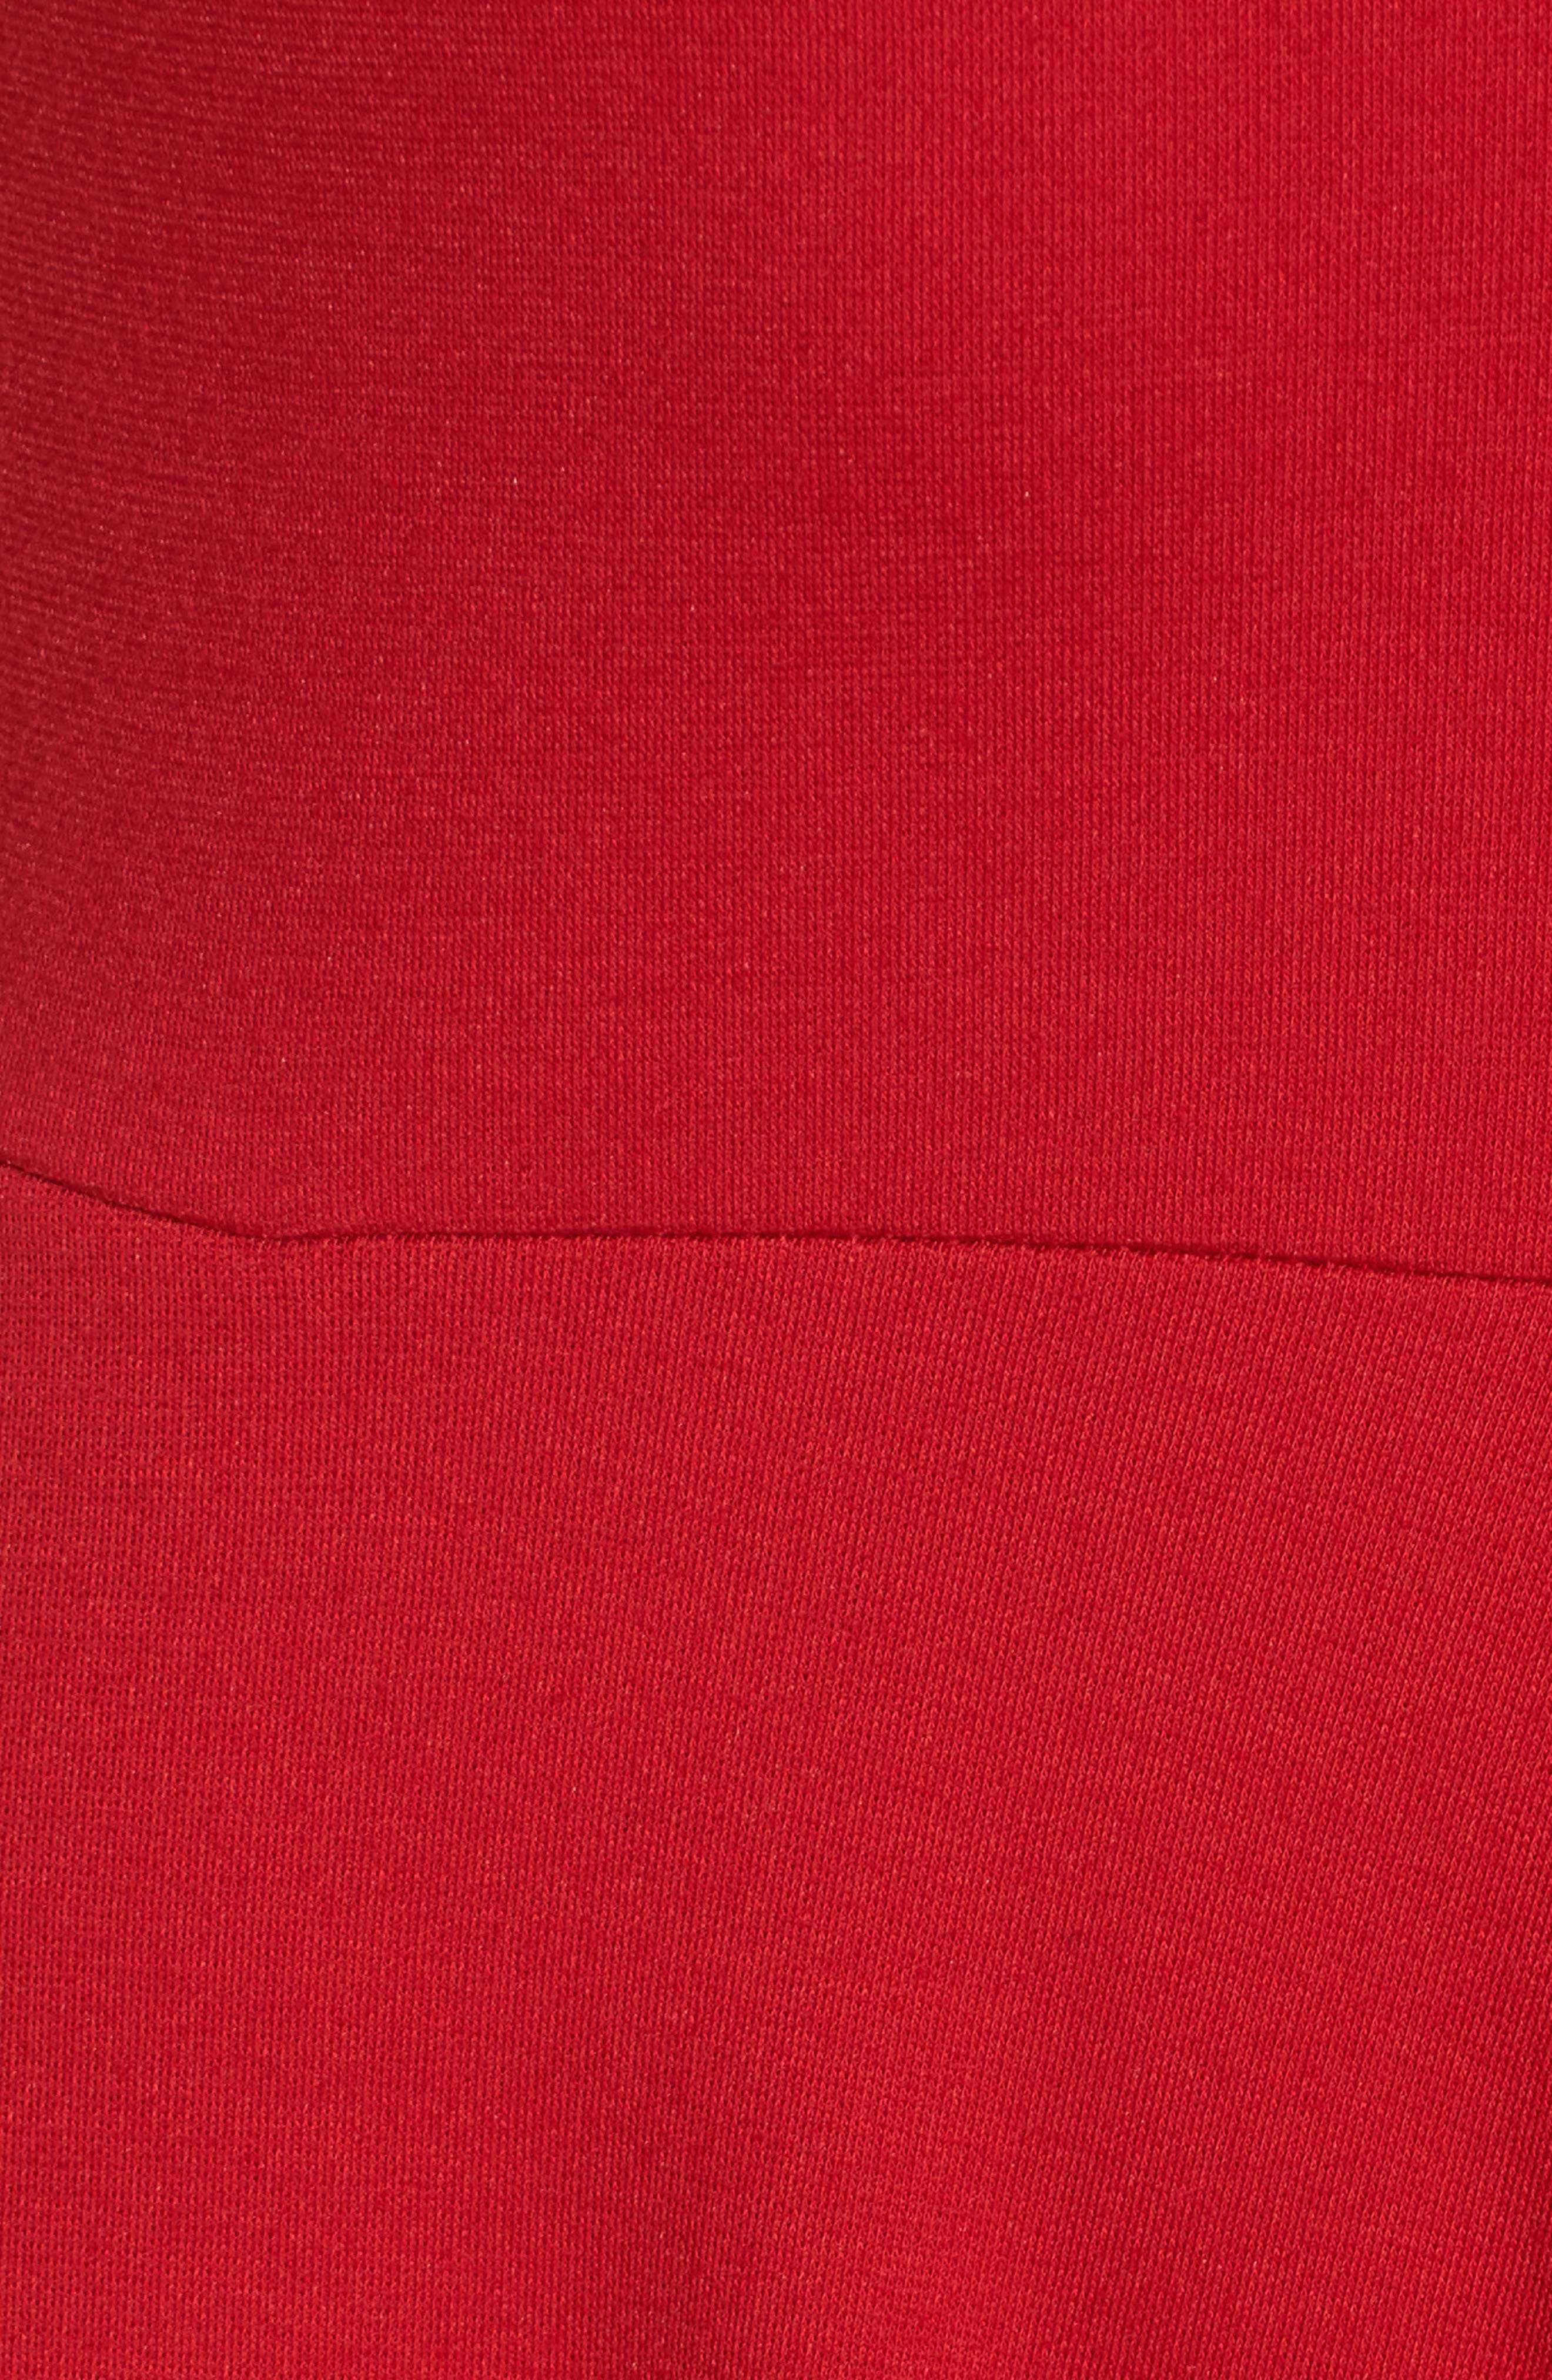 Stretch Knit Midi Dress,                             Alternate thumbnail 47, color,